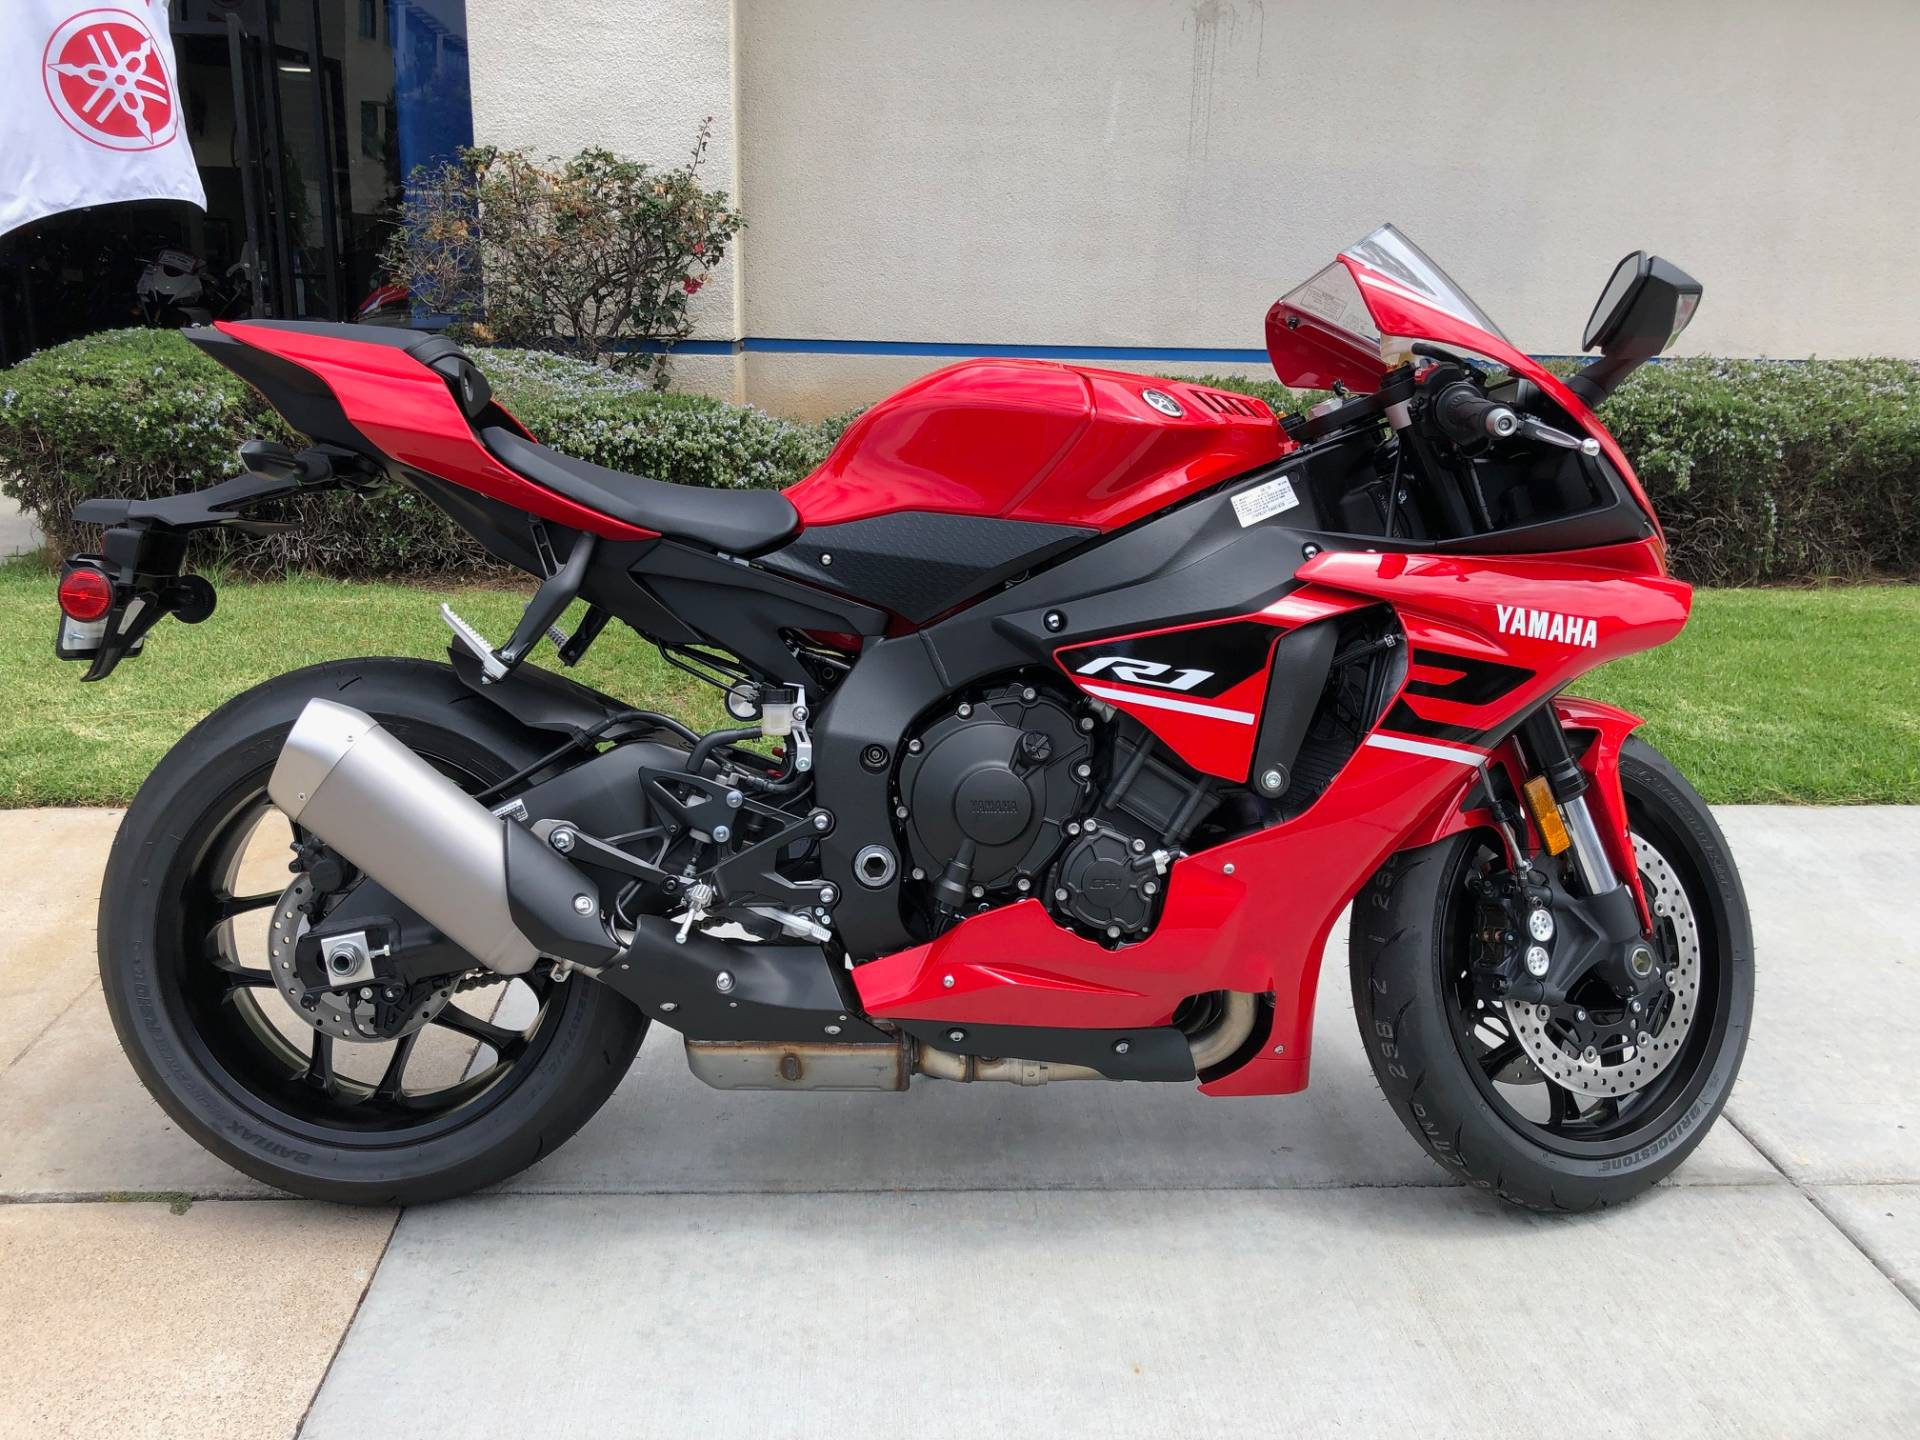 2019 Yamaha Yzf R1 In El Cajon California